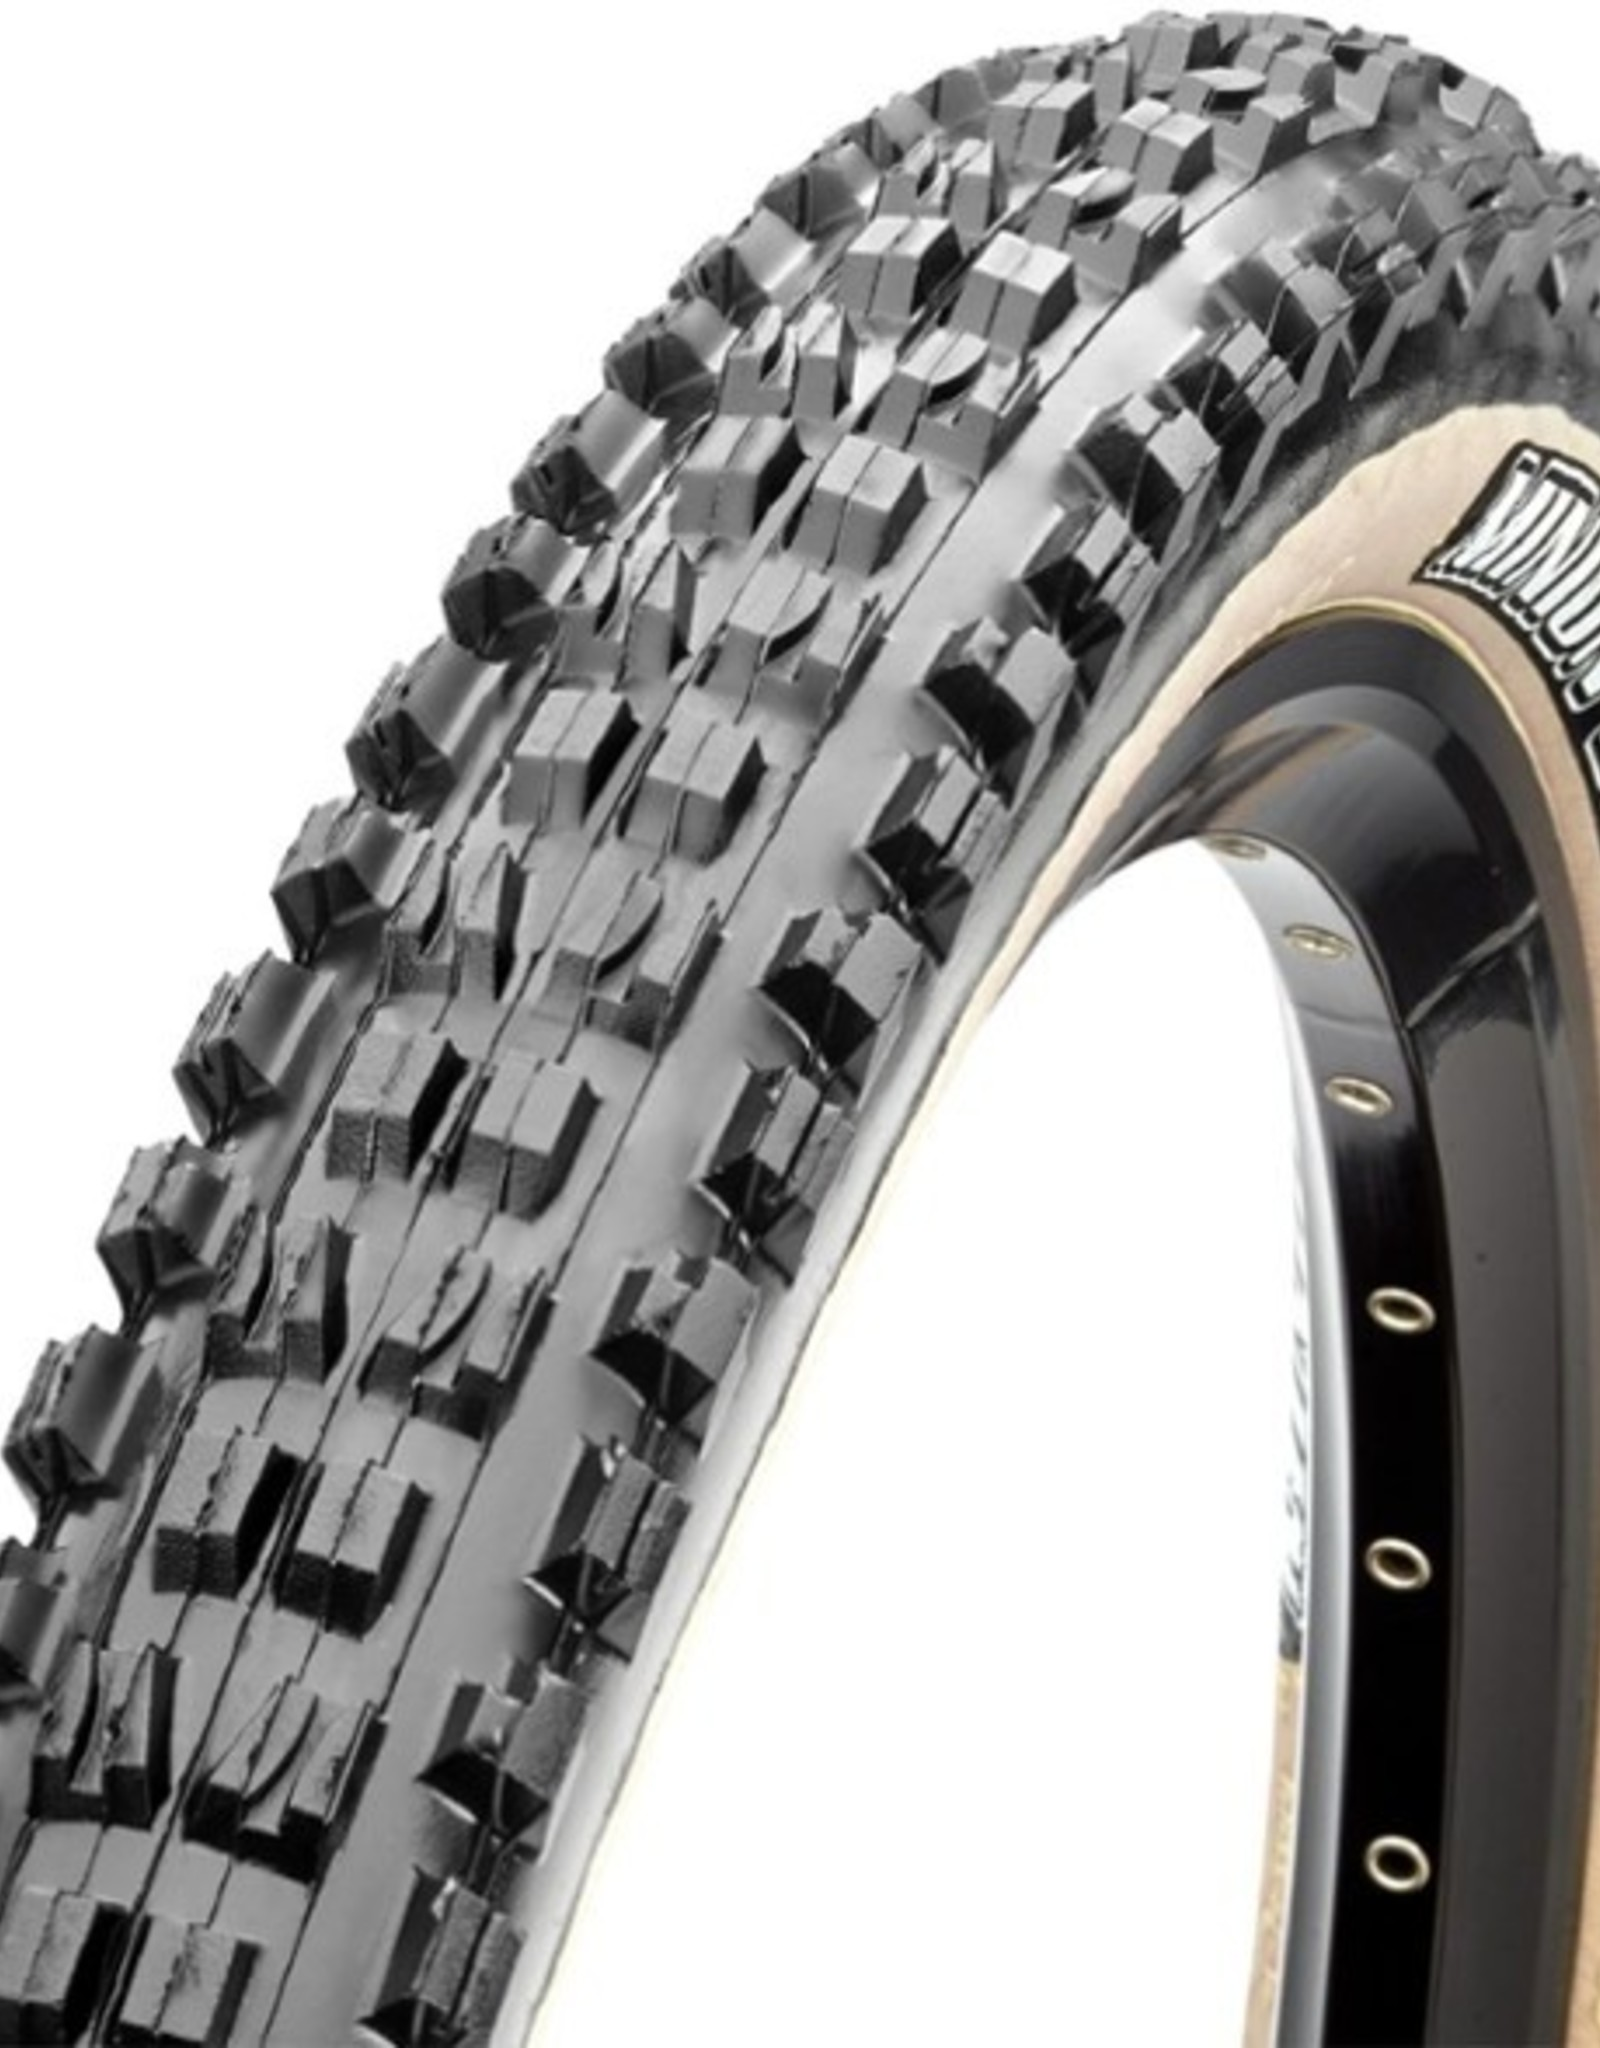 Maxxis Minion DHF Tire - 27.5 x 2.3, Tubeless, Folding, Black/Tan, 3C Maxx Terra, EXO